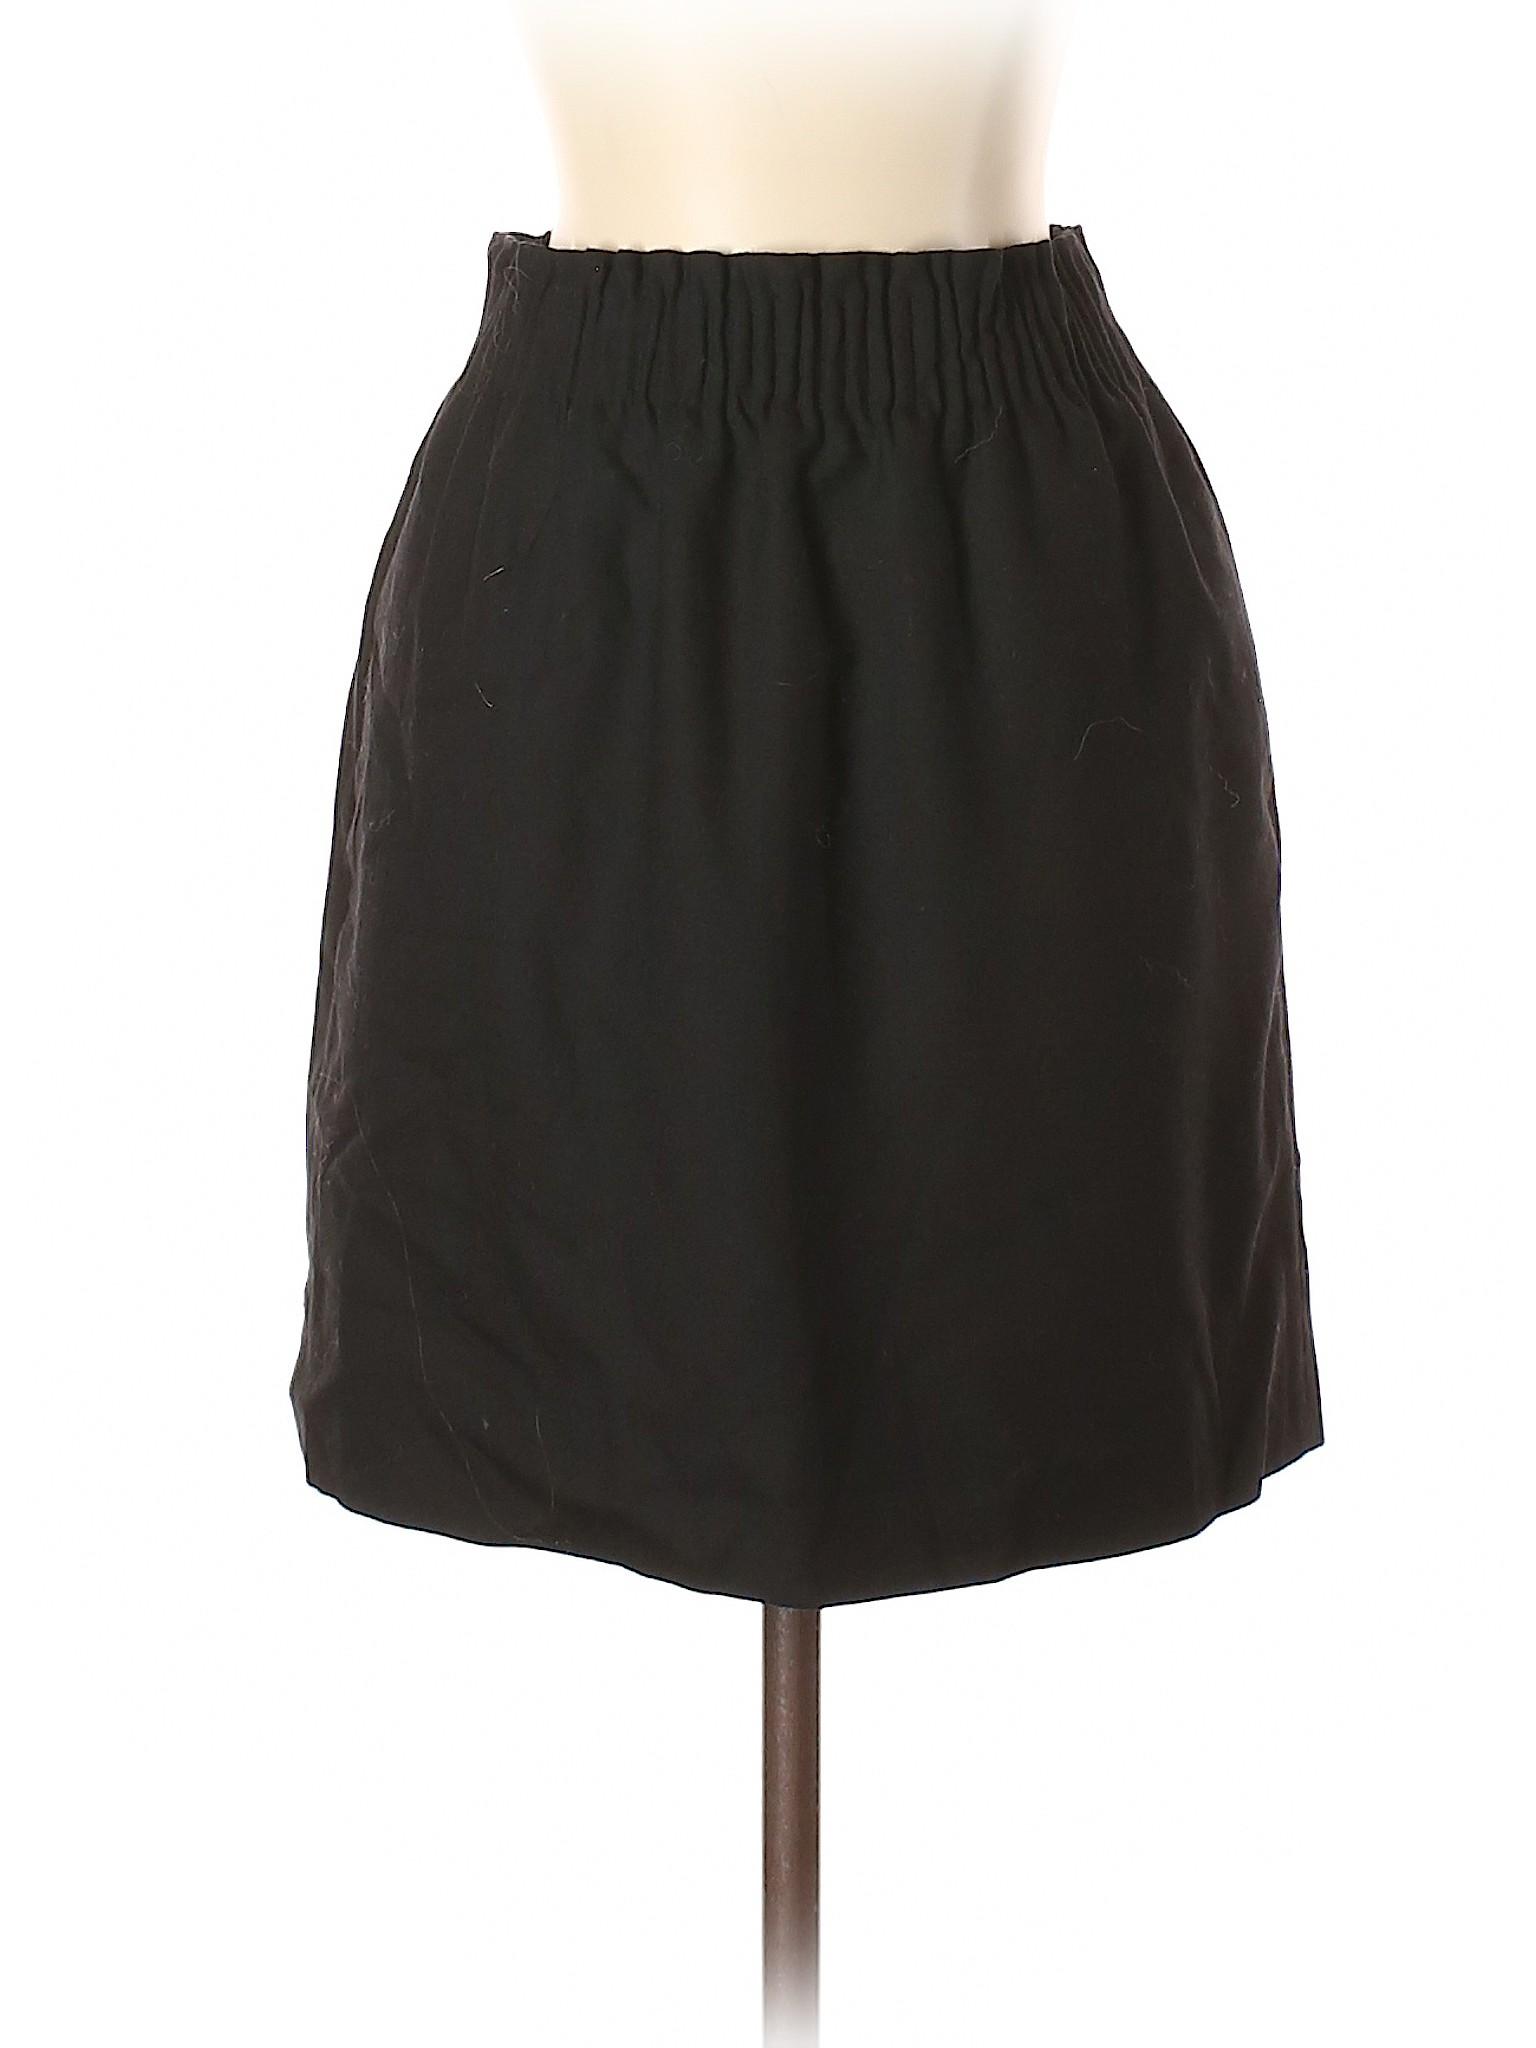 Casual Boutique Boutique Casual Skirt qxxZU67